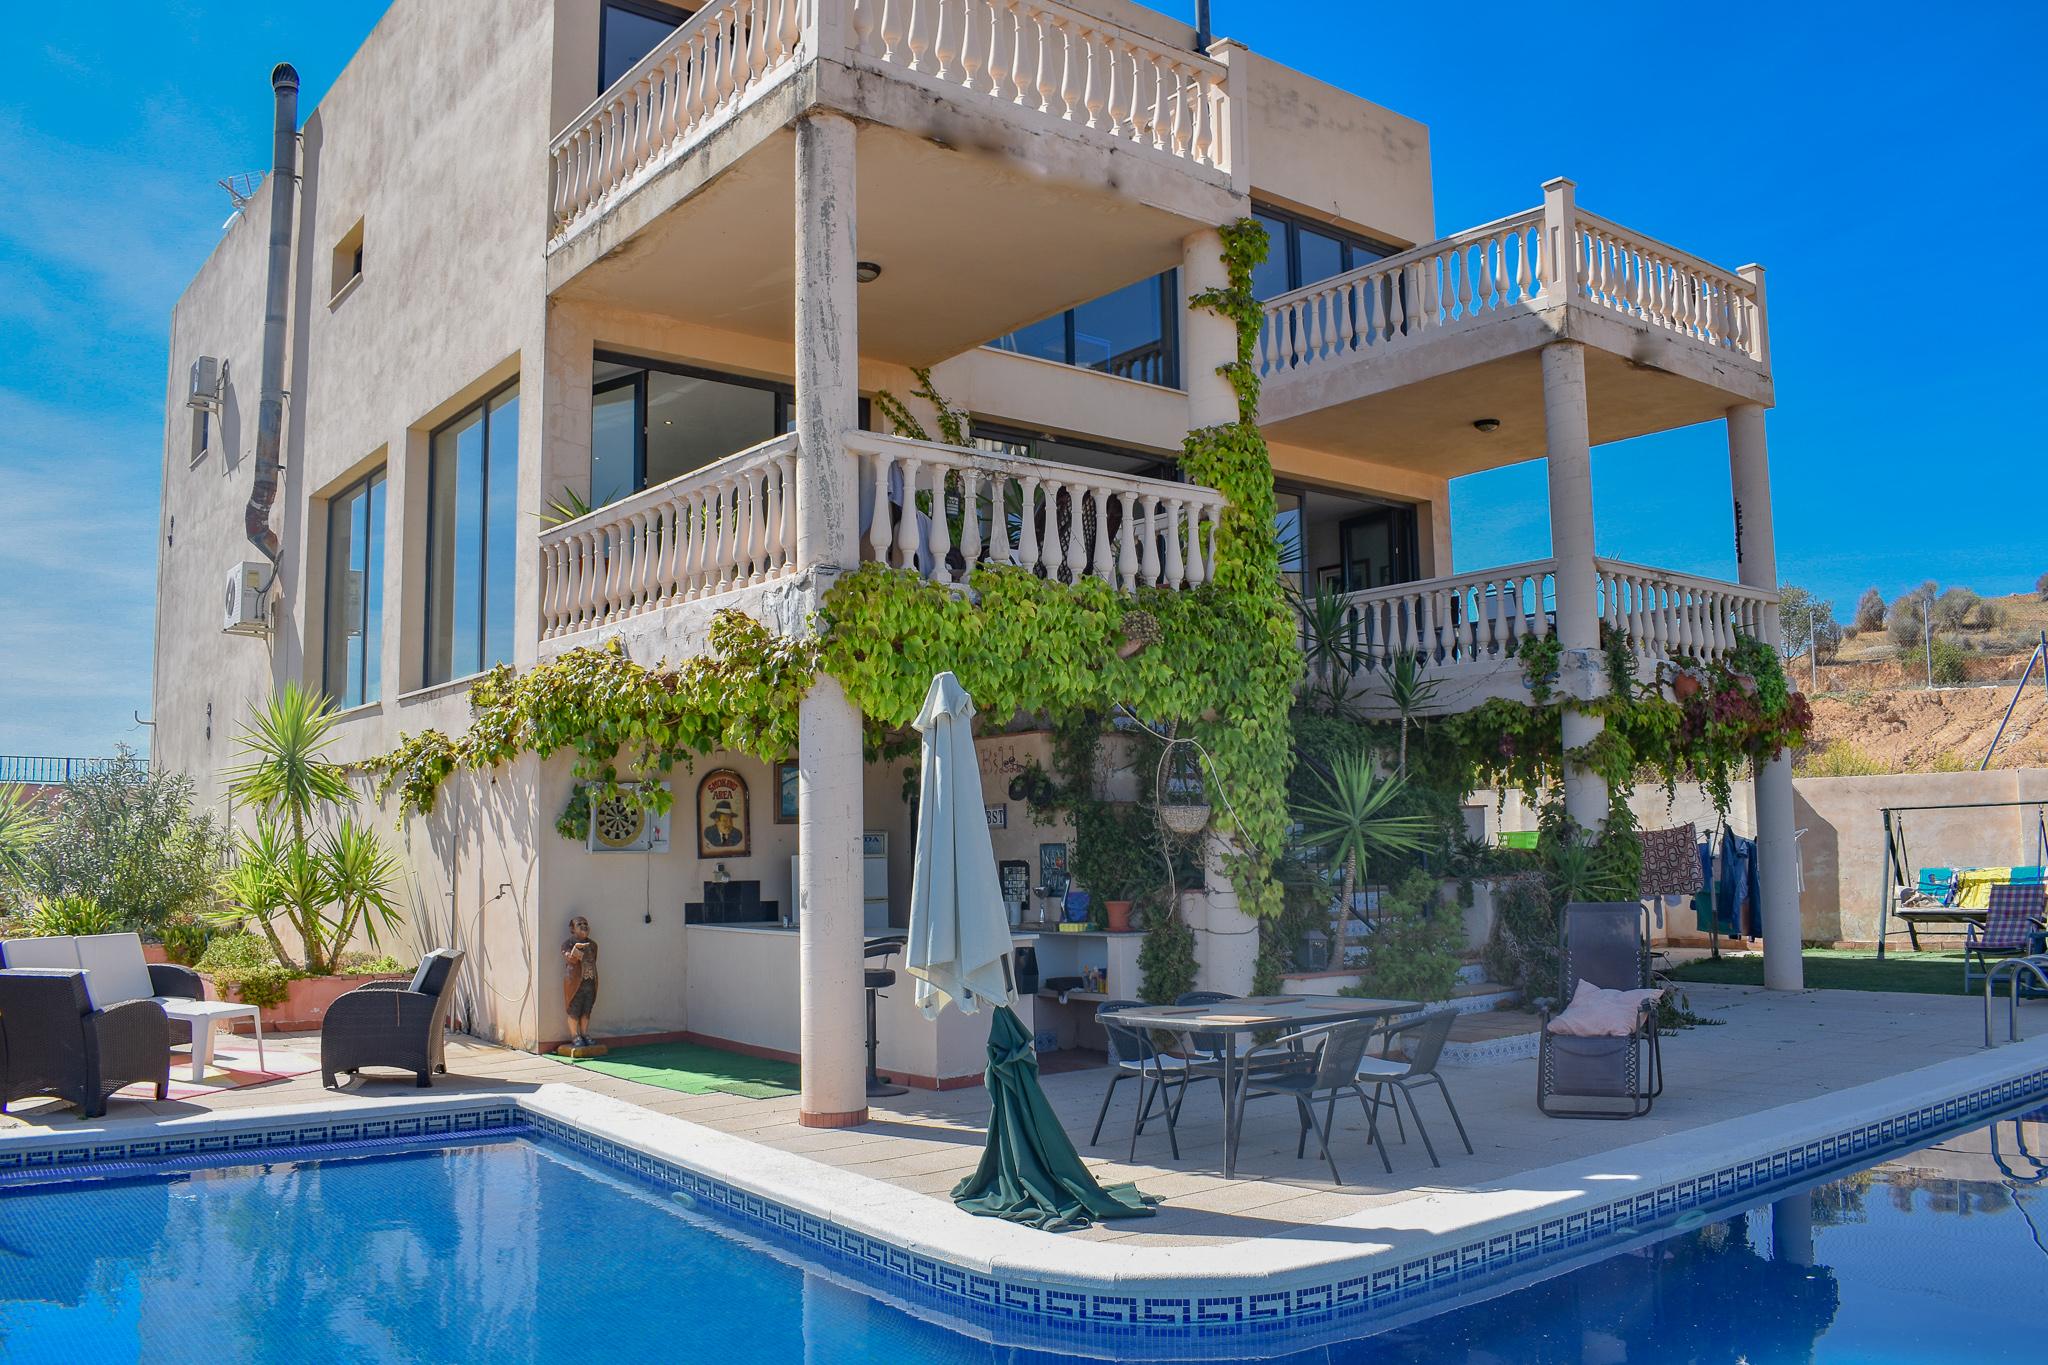 Detached villa for sale in Loja, Luxurious villa for sale inbetween granada city and Malaga city Spain. Exclusive with Granada estate agency.